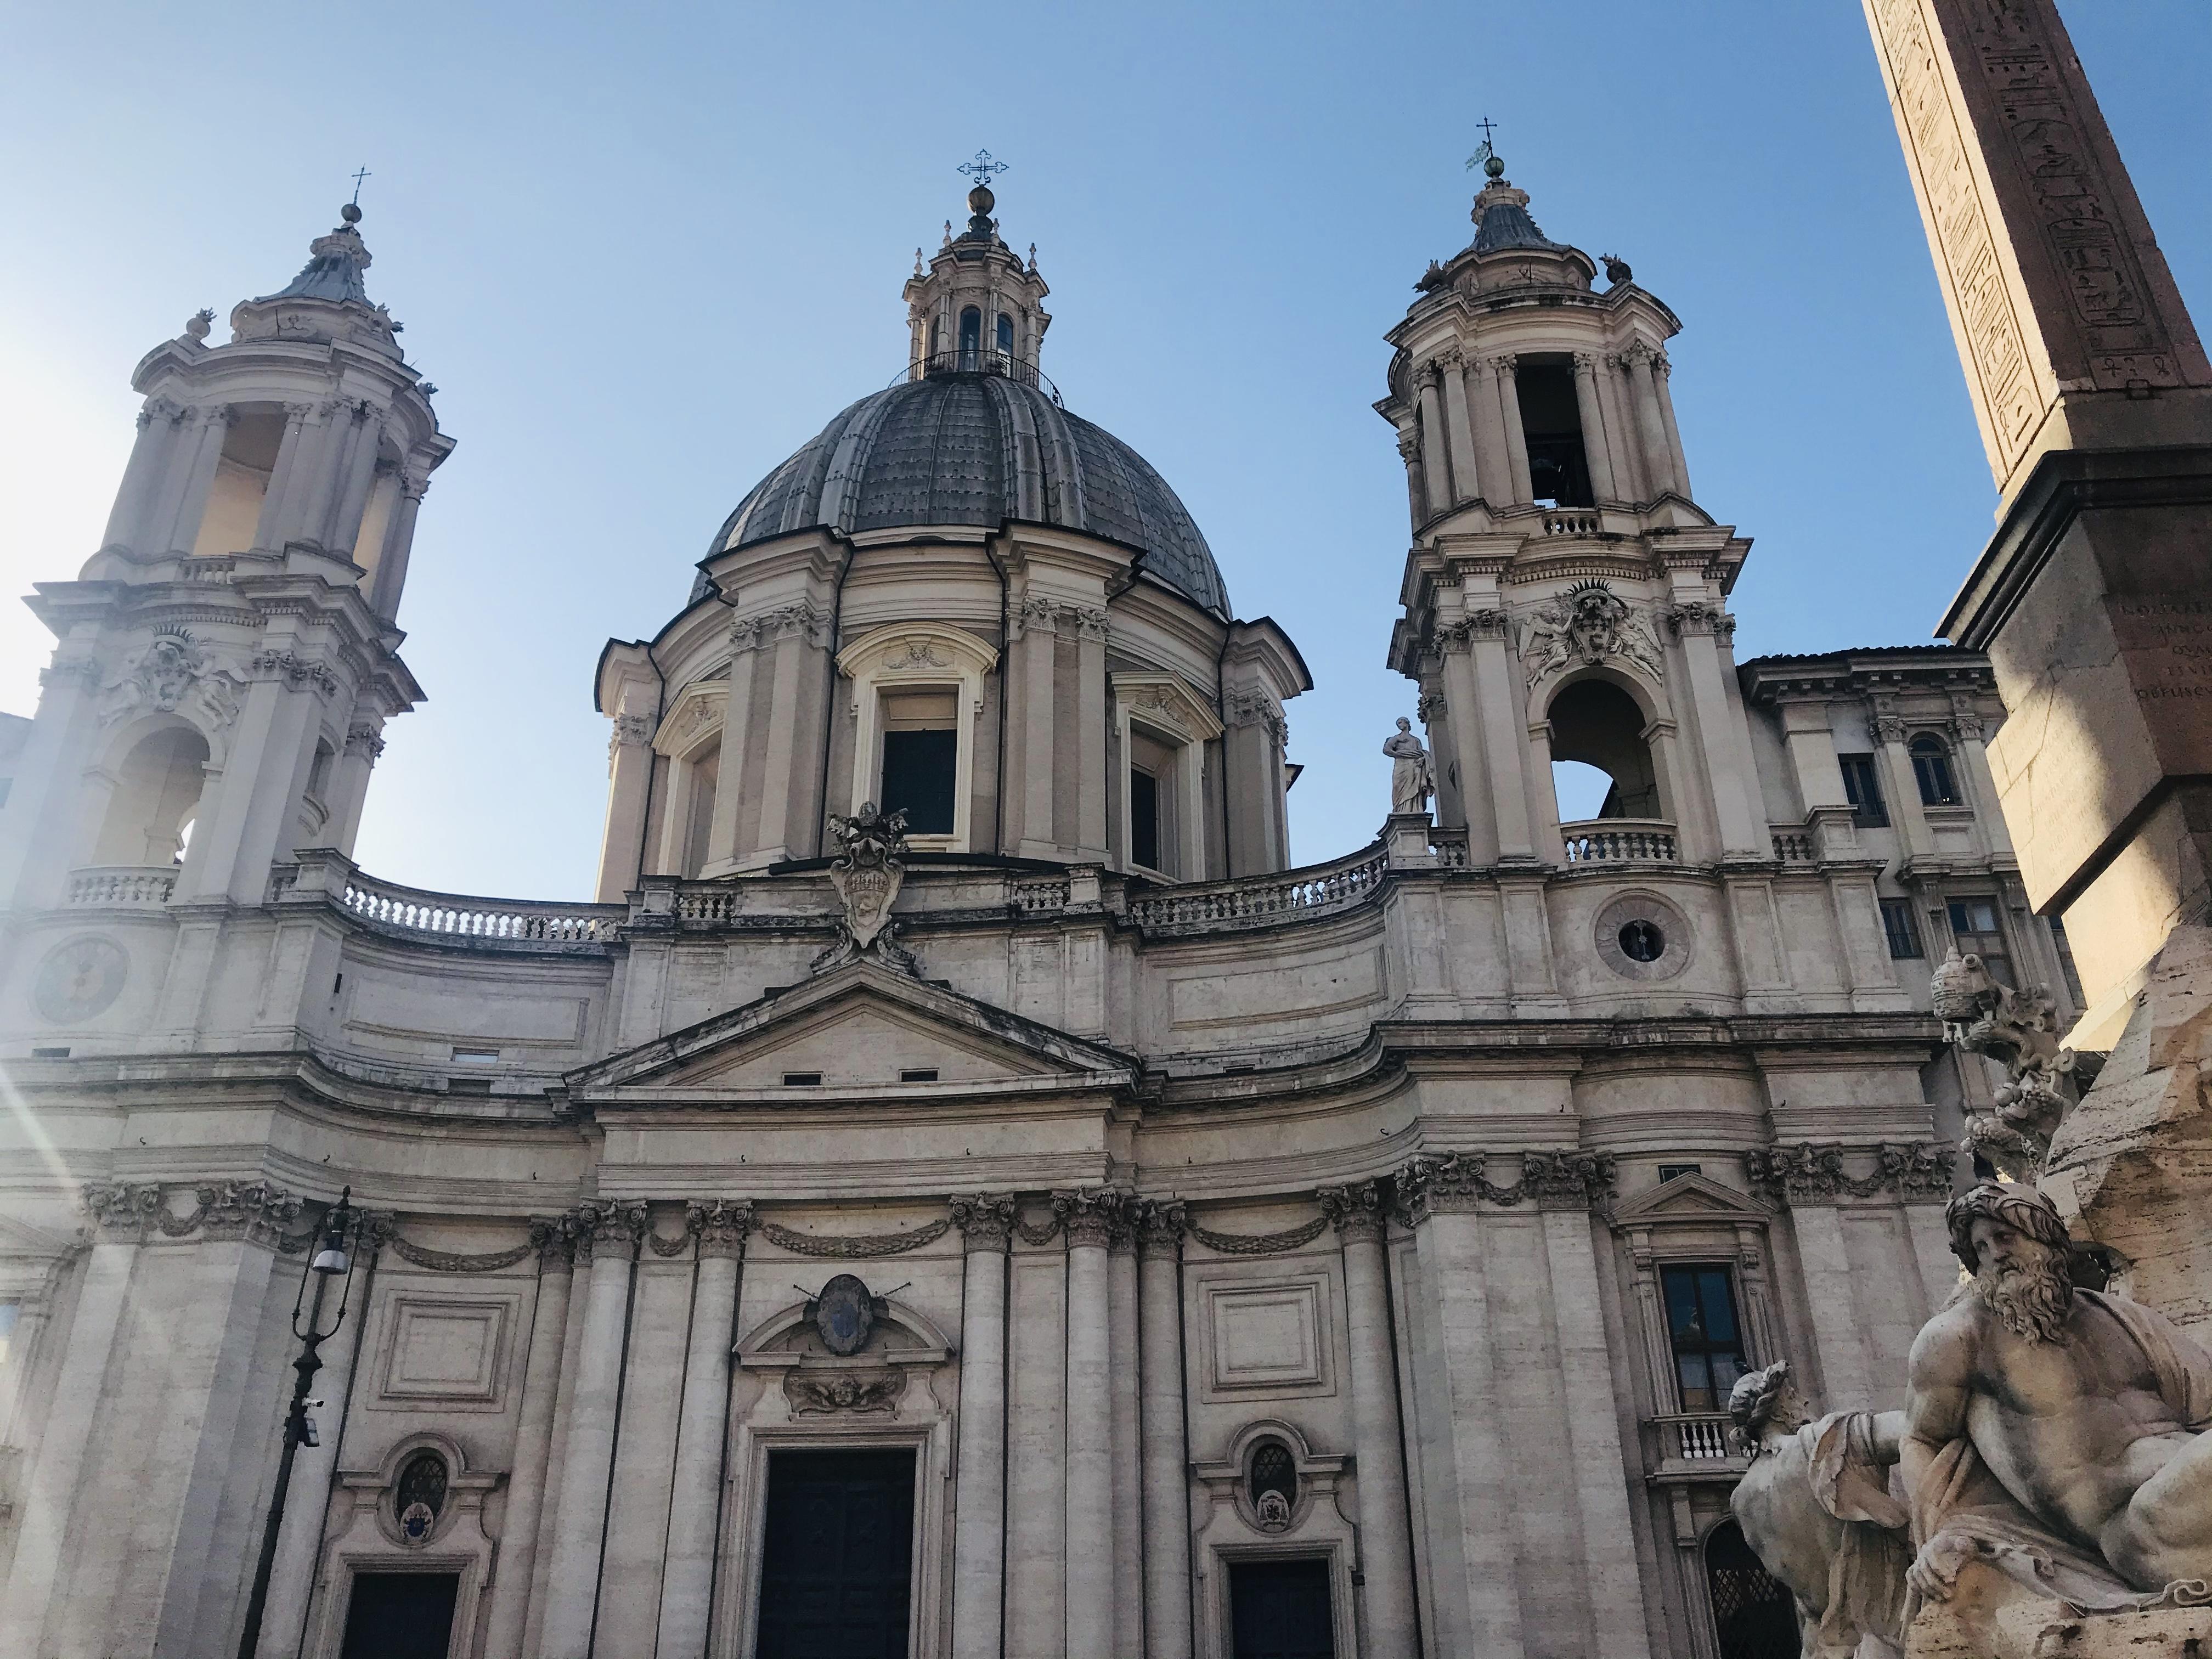 L'eterna sfida del barocco Bernini o Borromini? - Art Club - Associazione culturale - Visite guidate a Roma - Passeggiate culturali a Roma - il Barocco